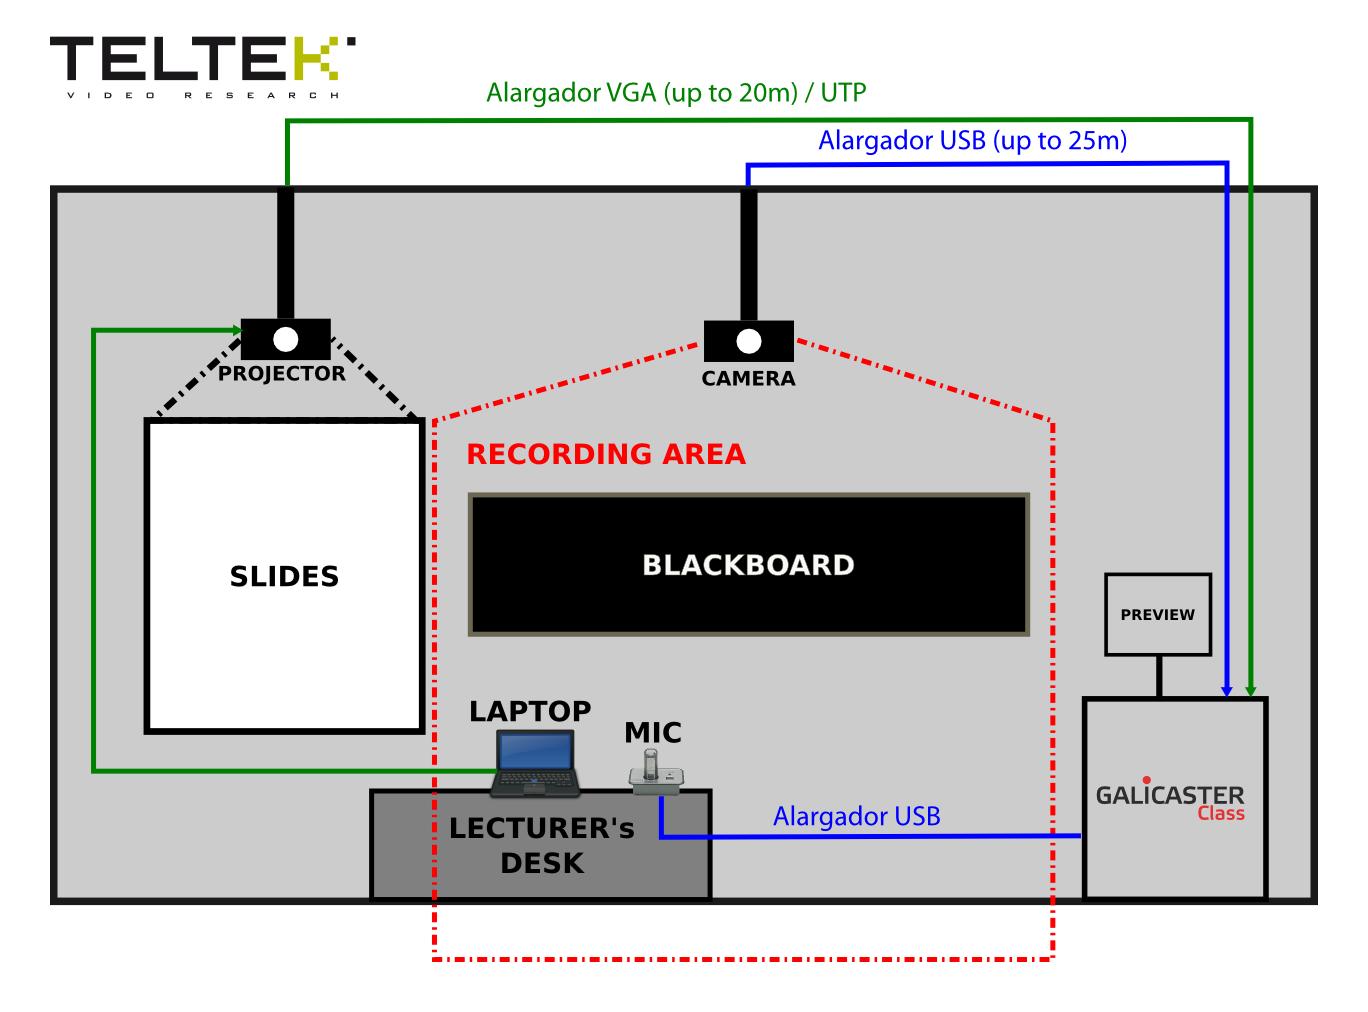 Galicaster Class Installation Guide - GALICASTER - Teltek Video